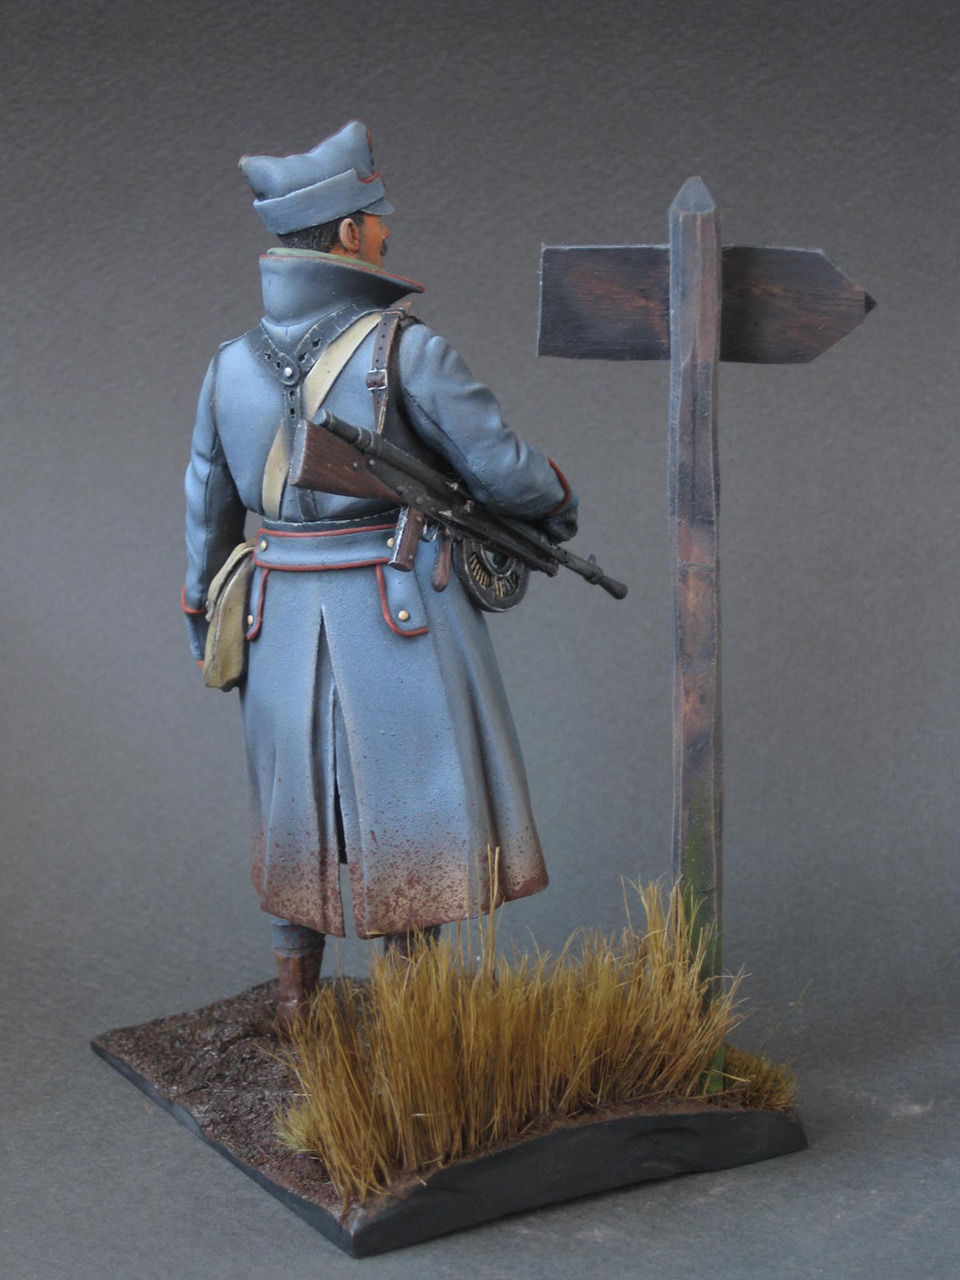 Figures: Romanian machine gunner, 1916, photo #5